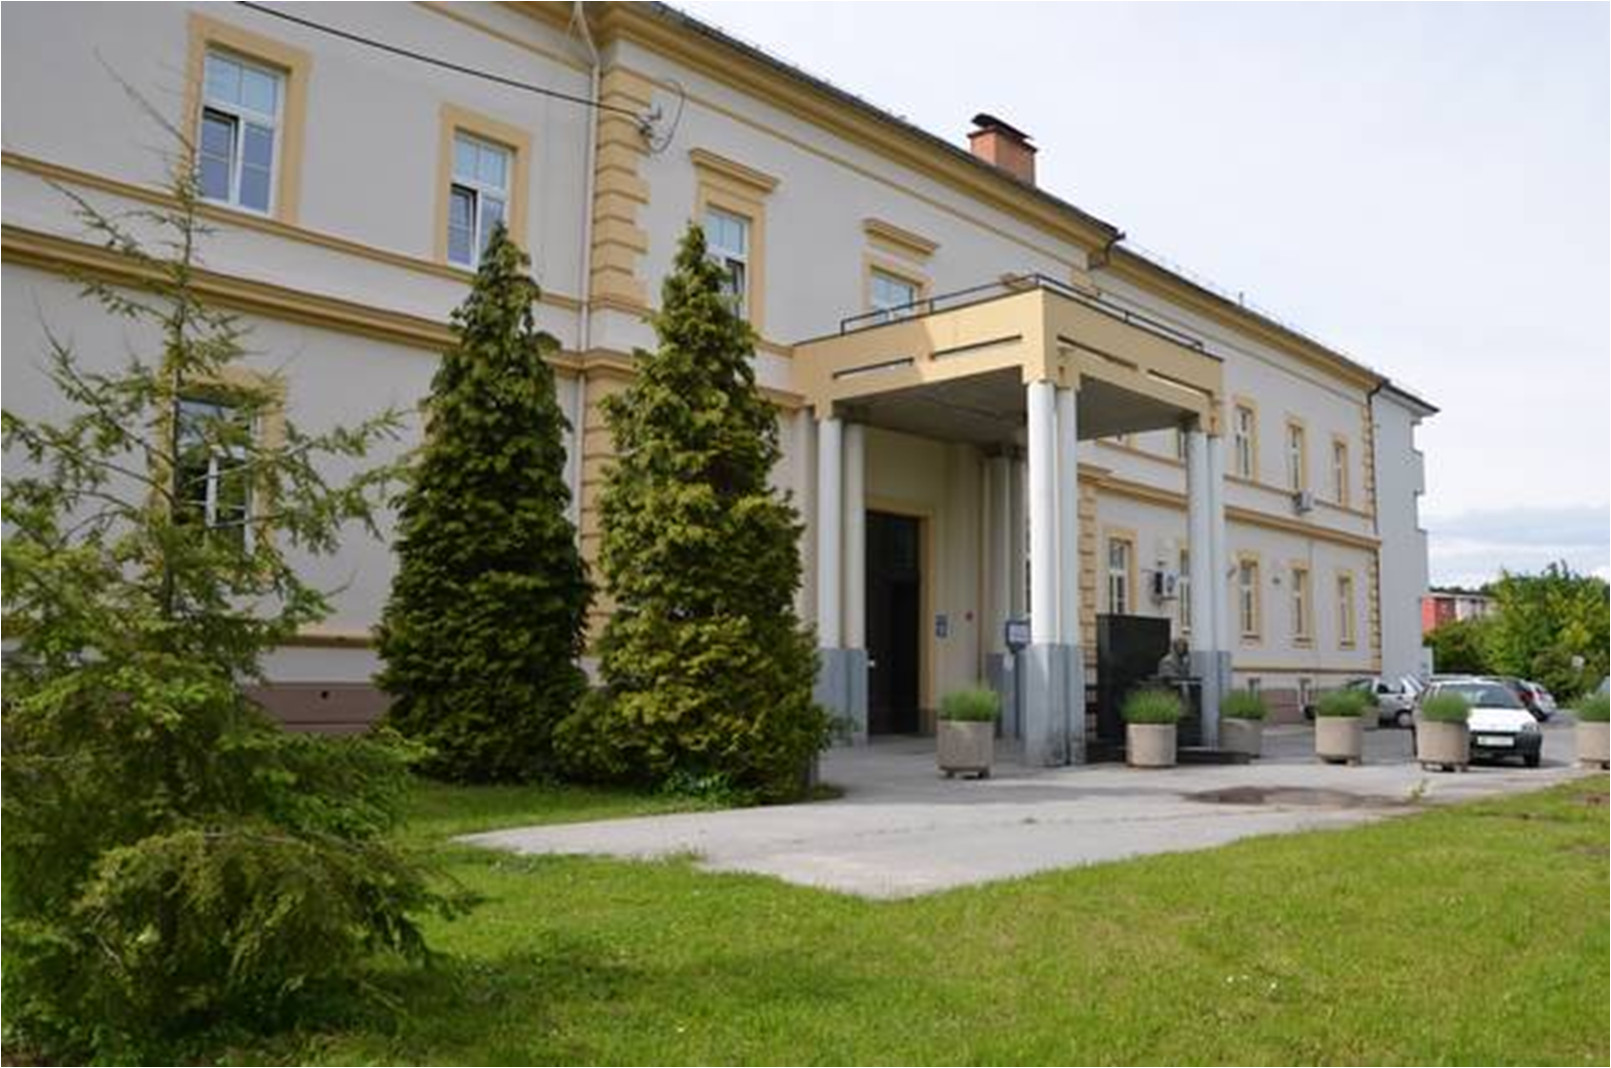 Splošna bolnišnica Ptuj, energetska sanacija